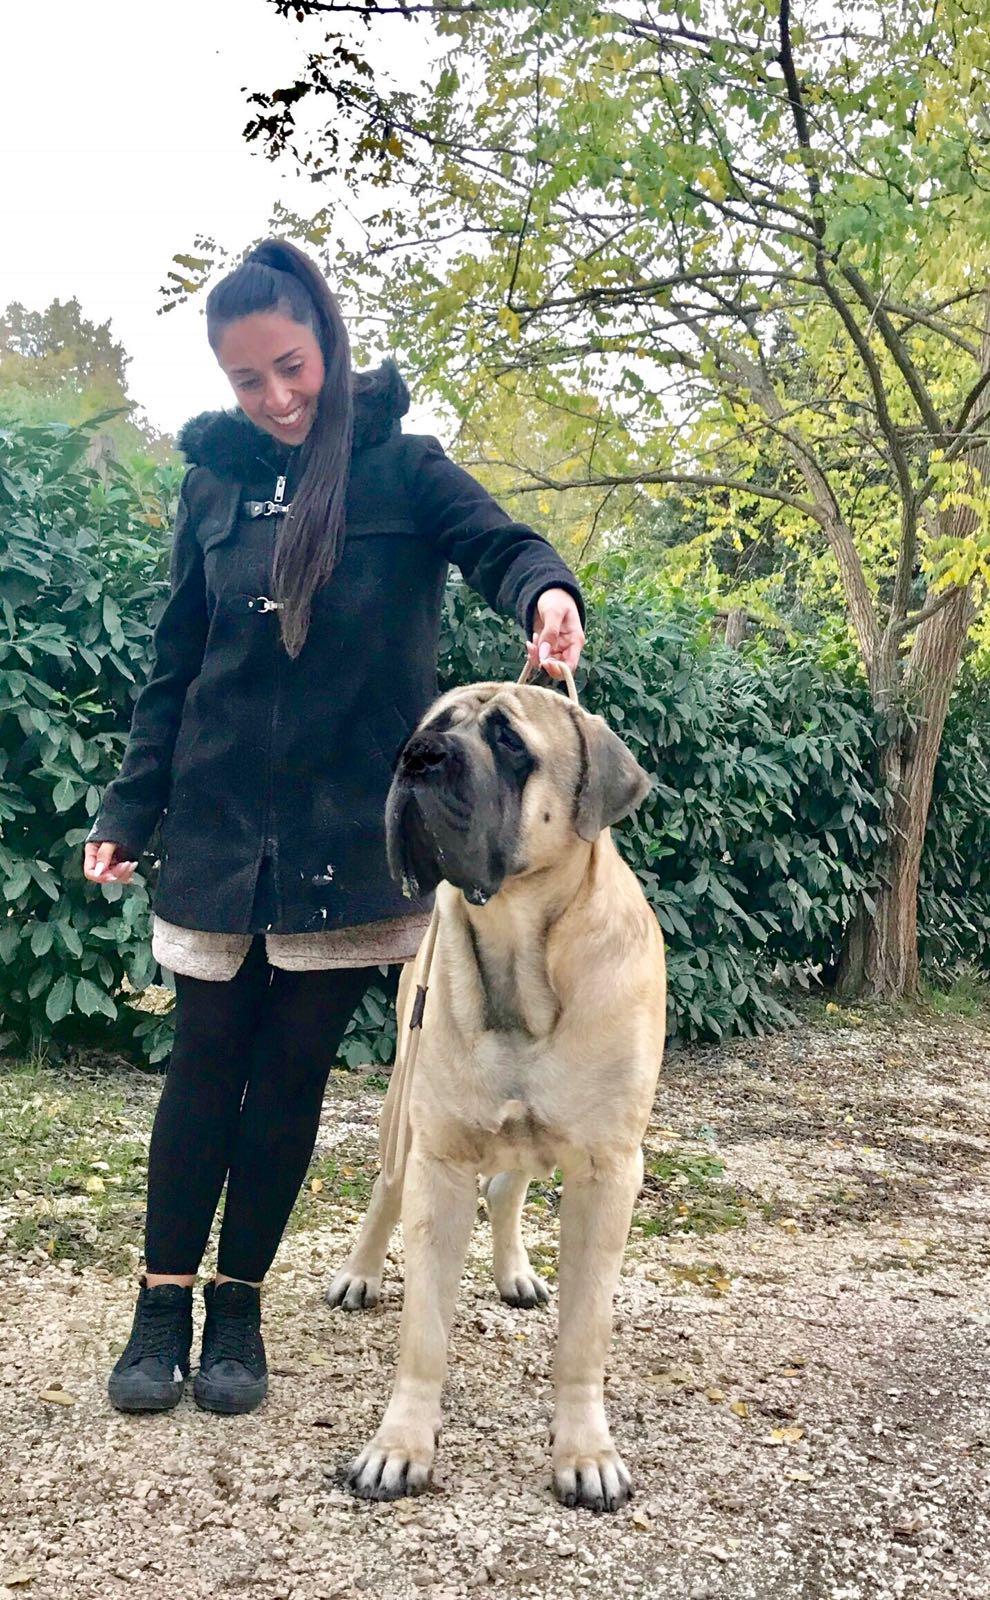 Ermineo del Fracasso con la sua handler Chiara Bramante Aliffi